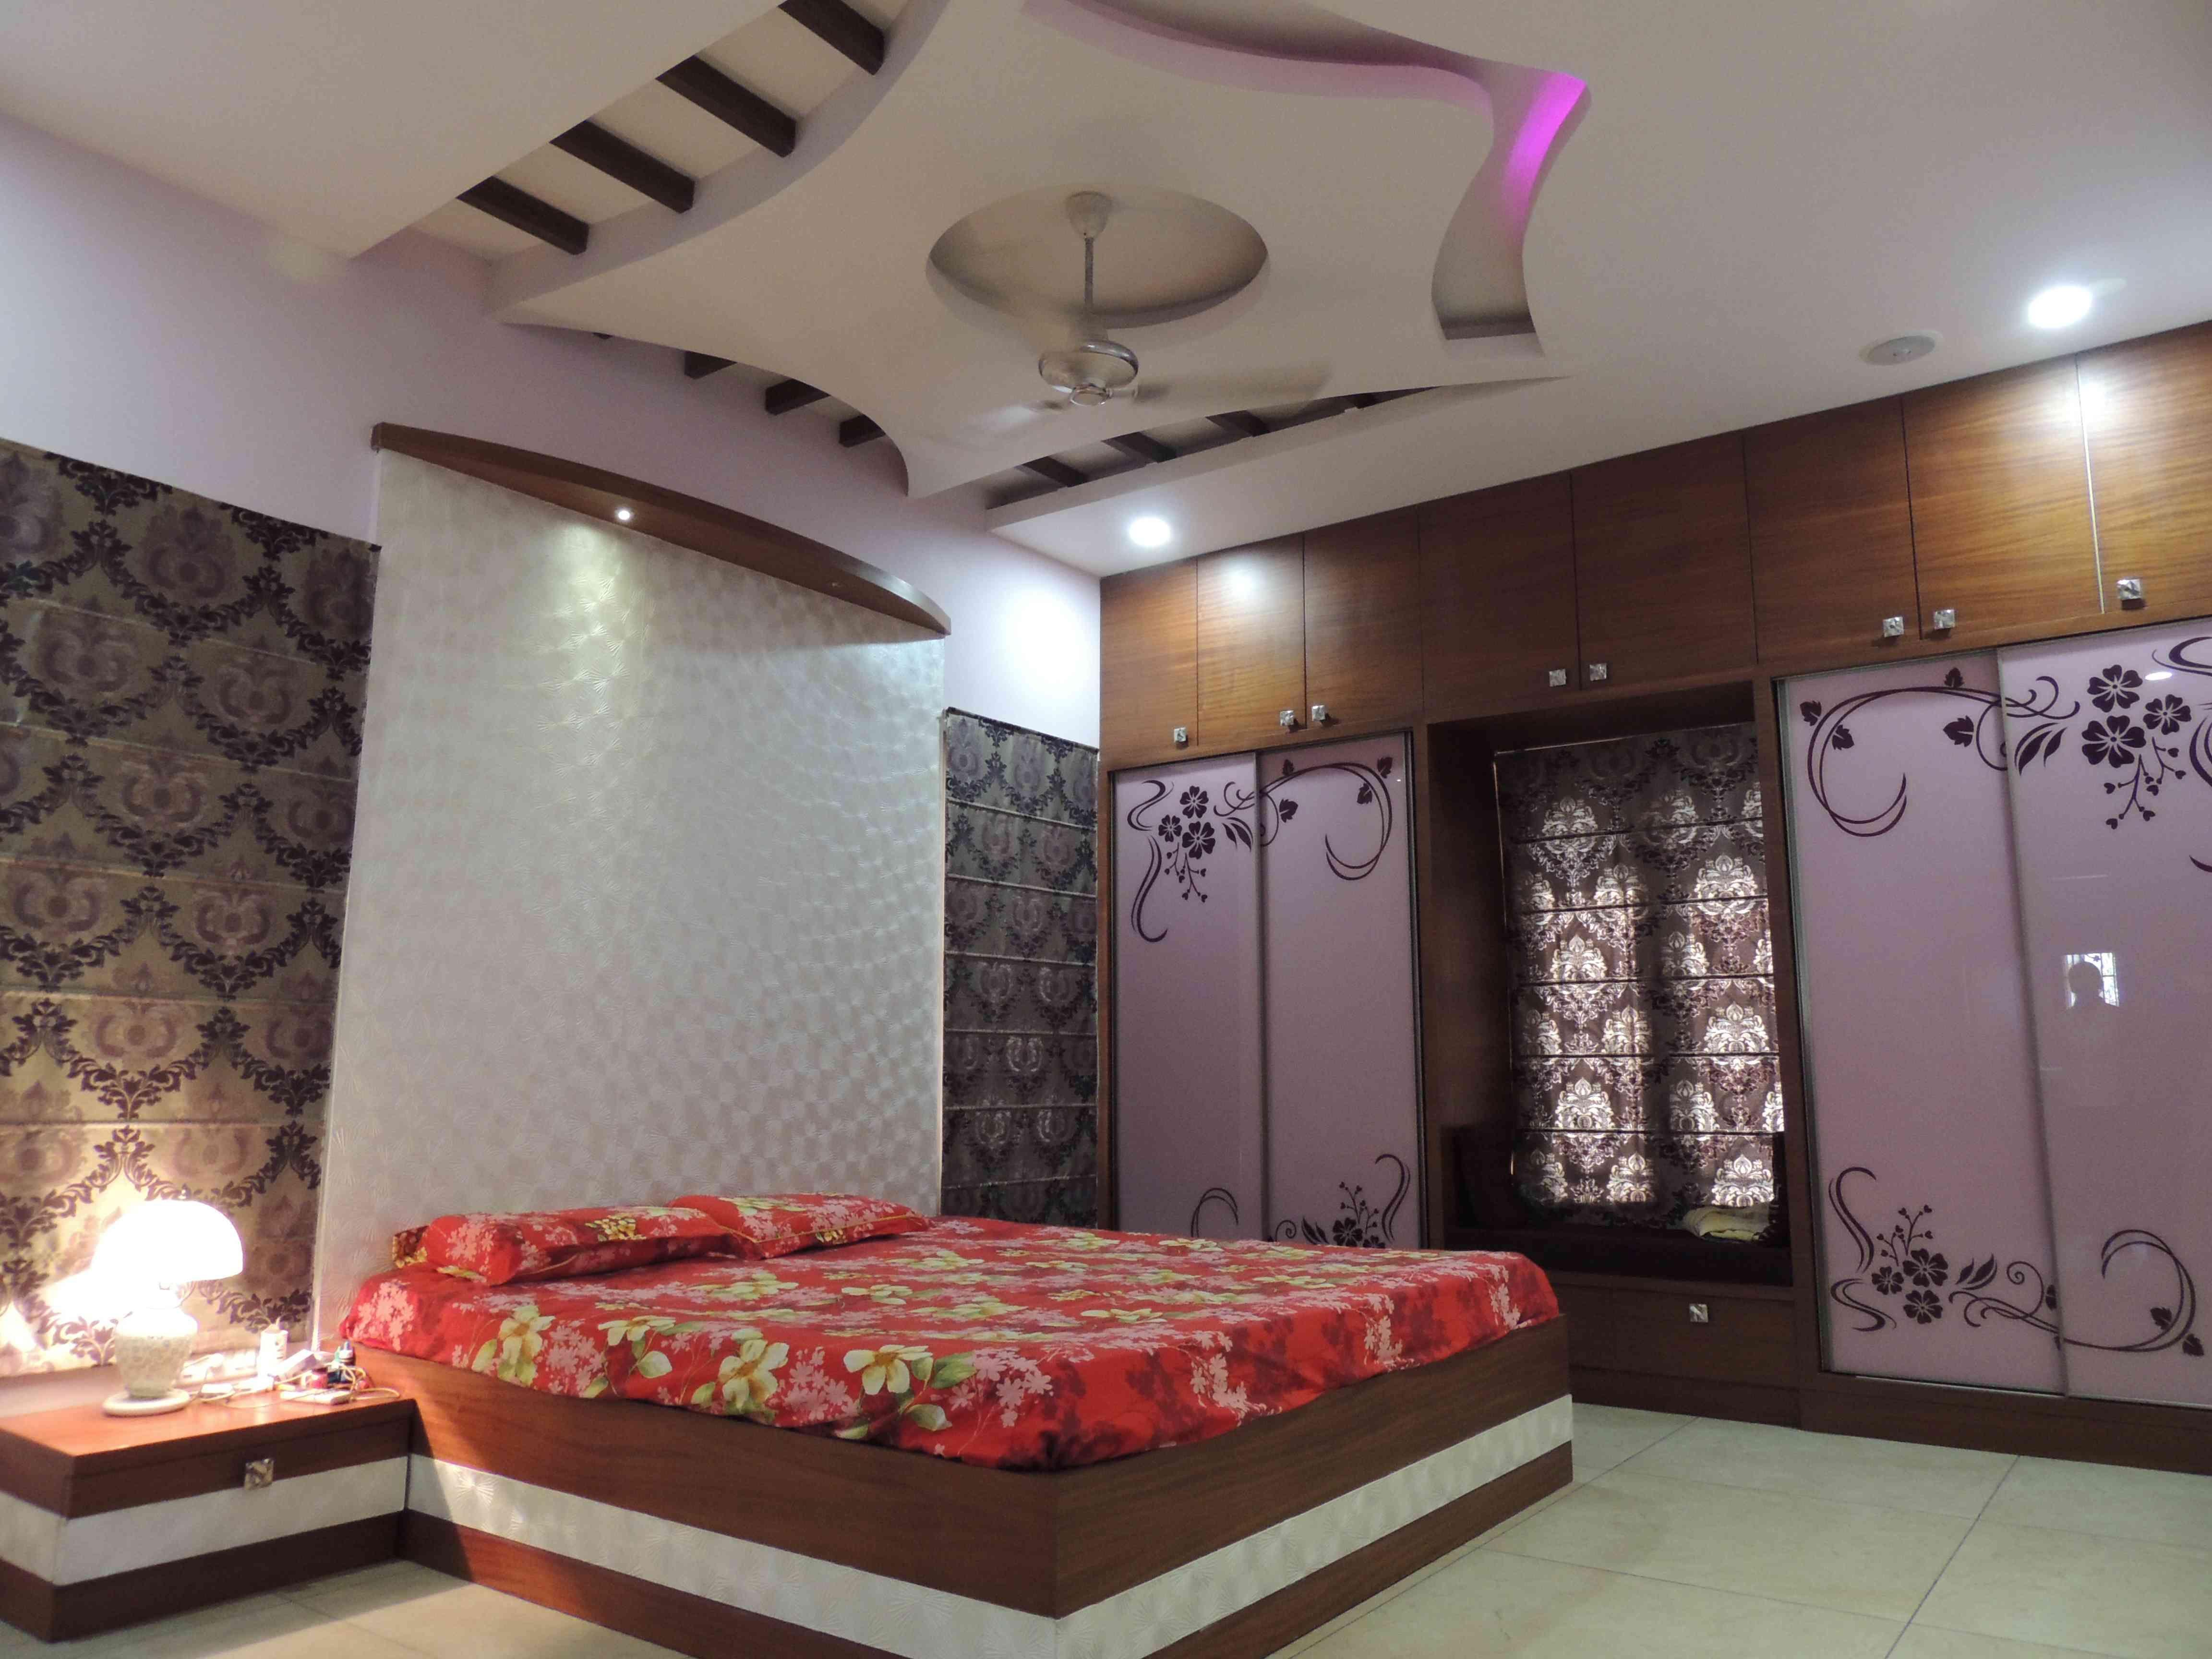 Design Surbhi Reddy Panache De Interiors Interior Designers In